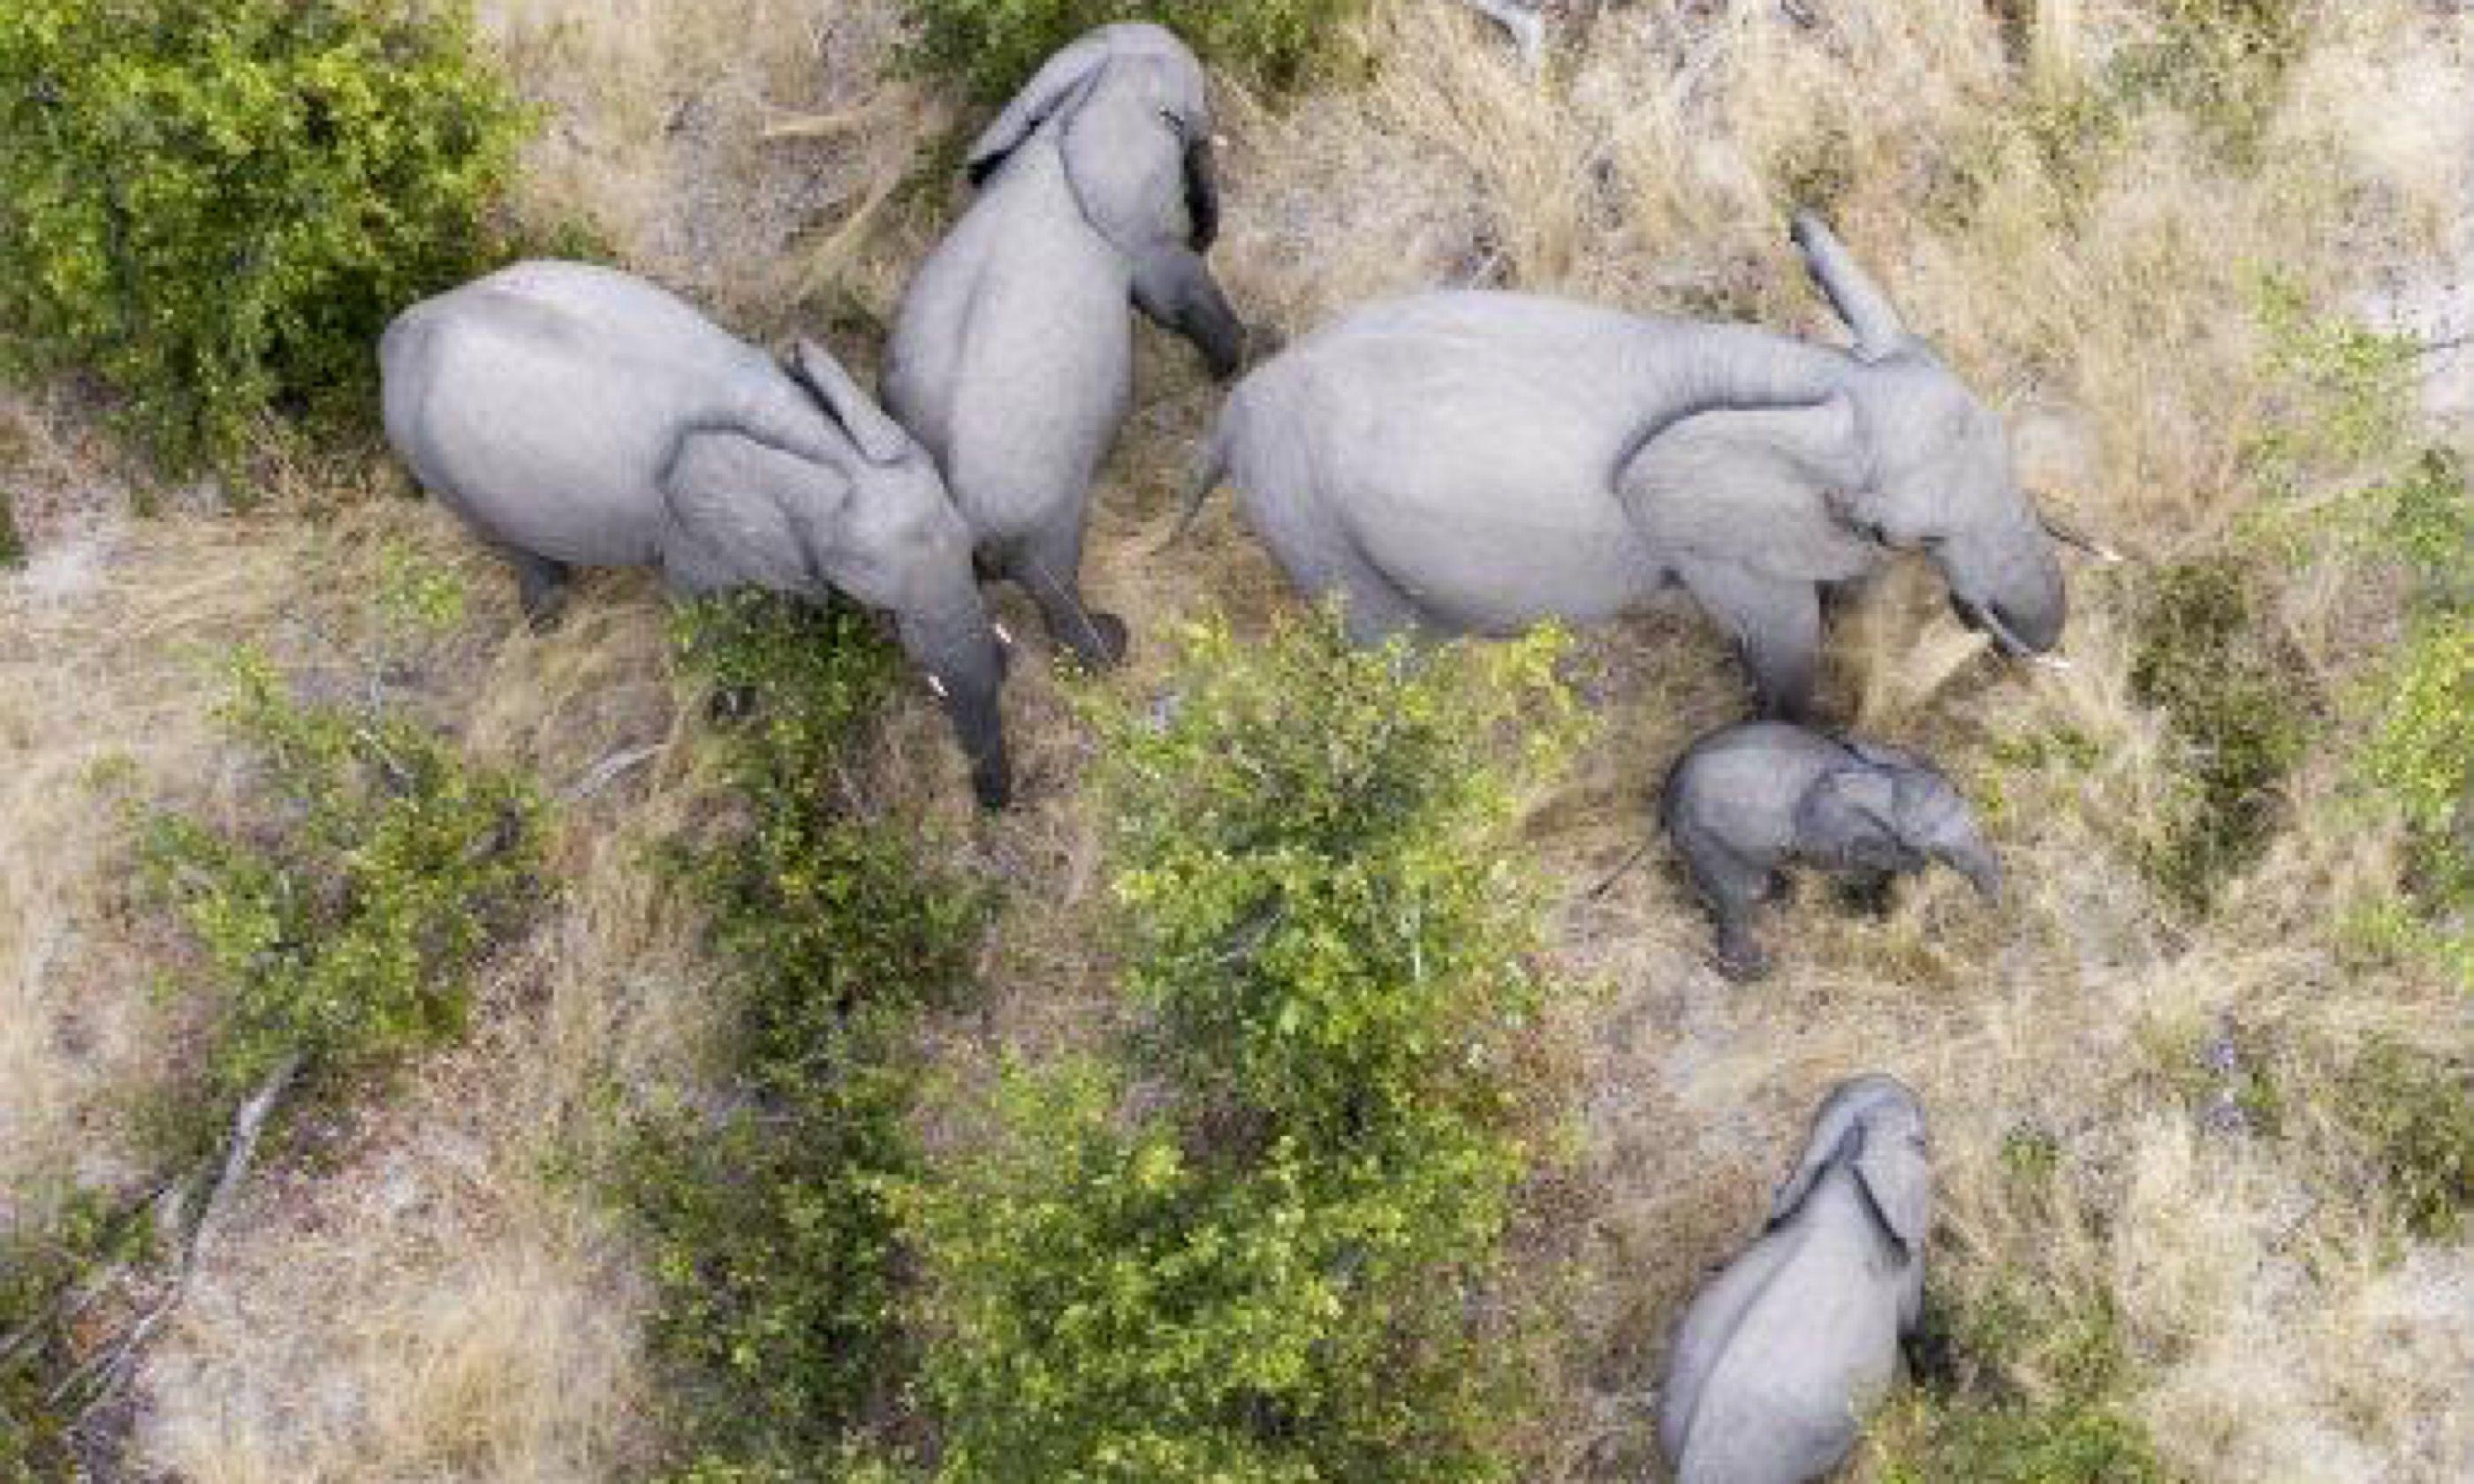 Elephants in the delta (Edwina Cagol)